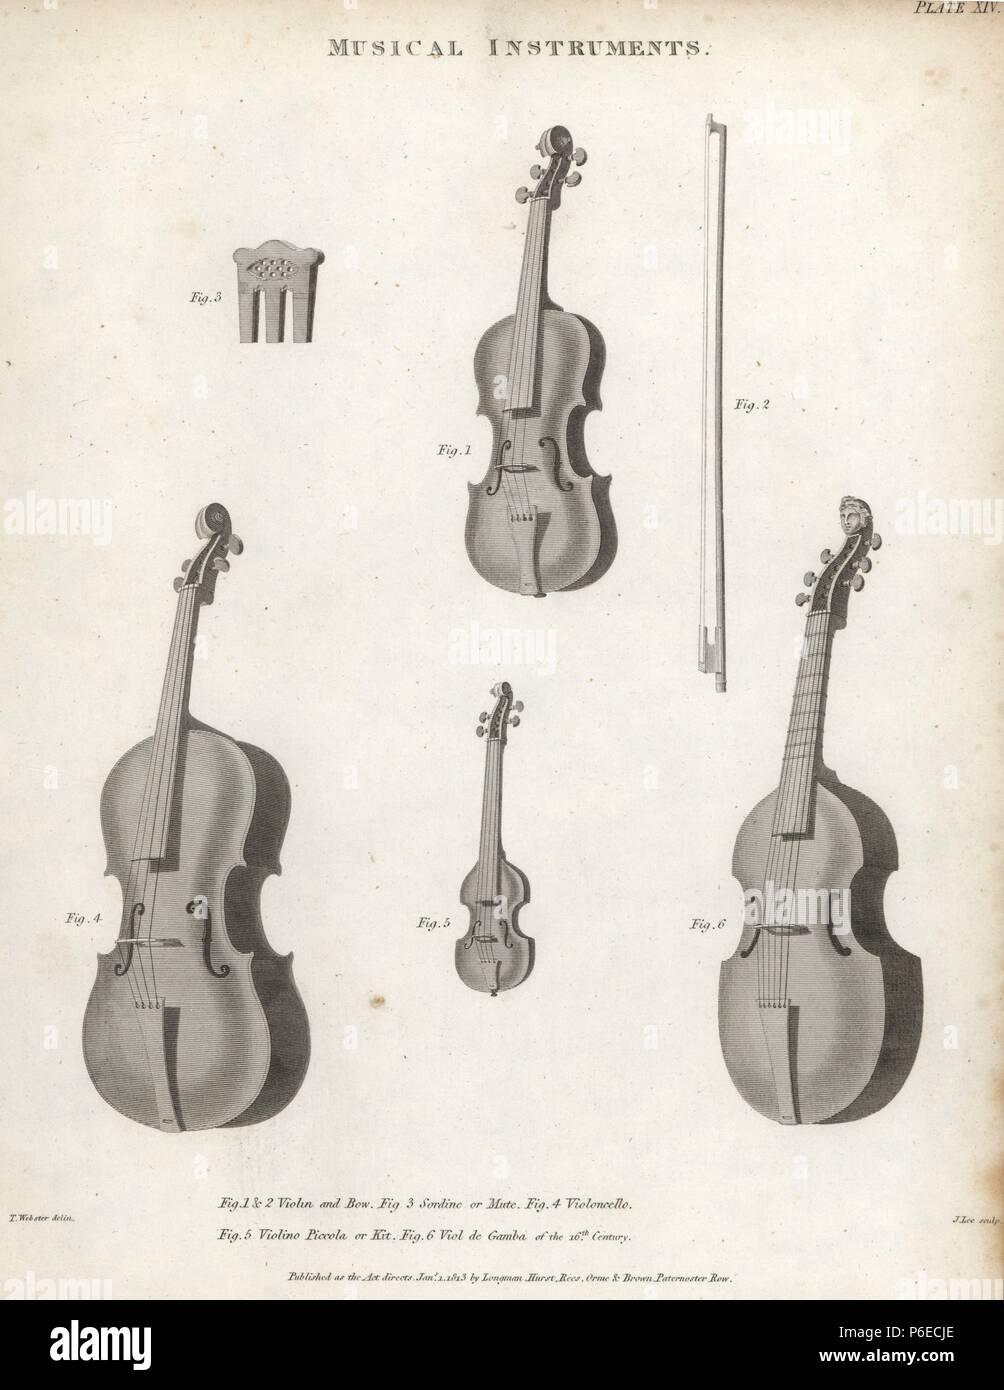 5 Stringed Instrument Stock Photos & 5 Stringed Instrument Stock